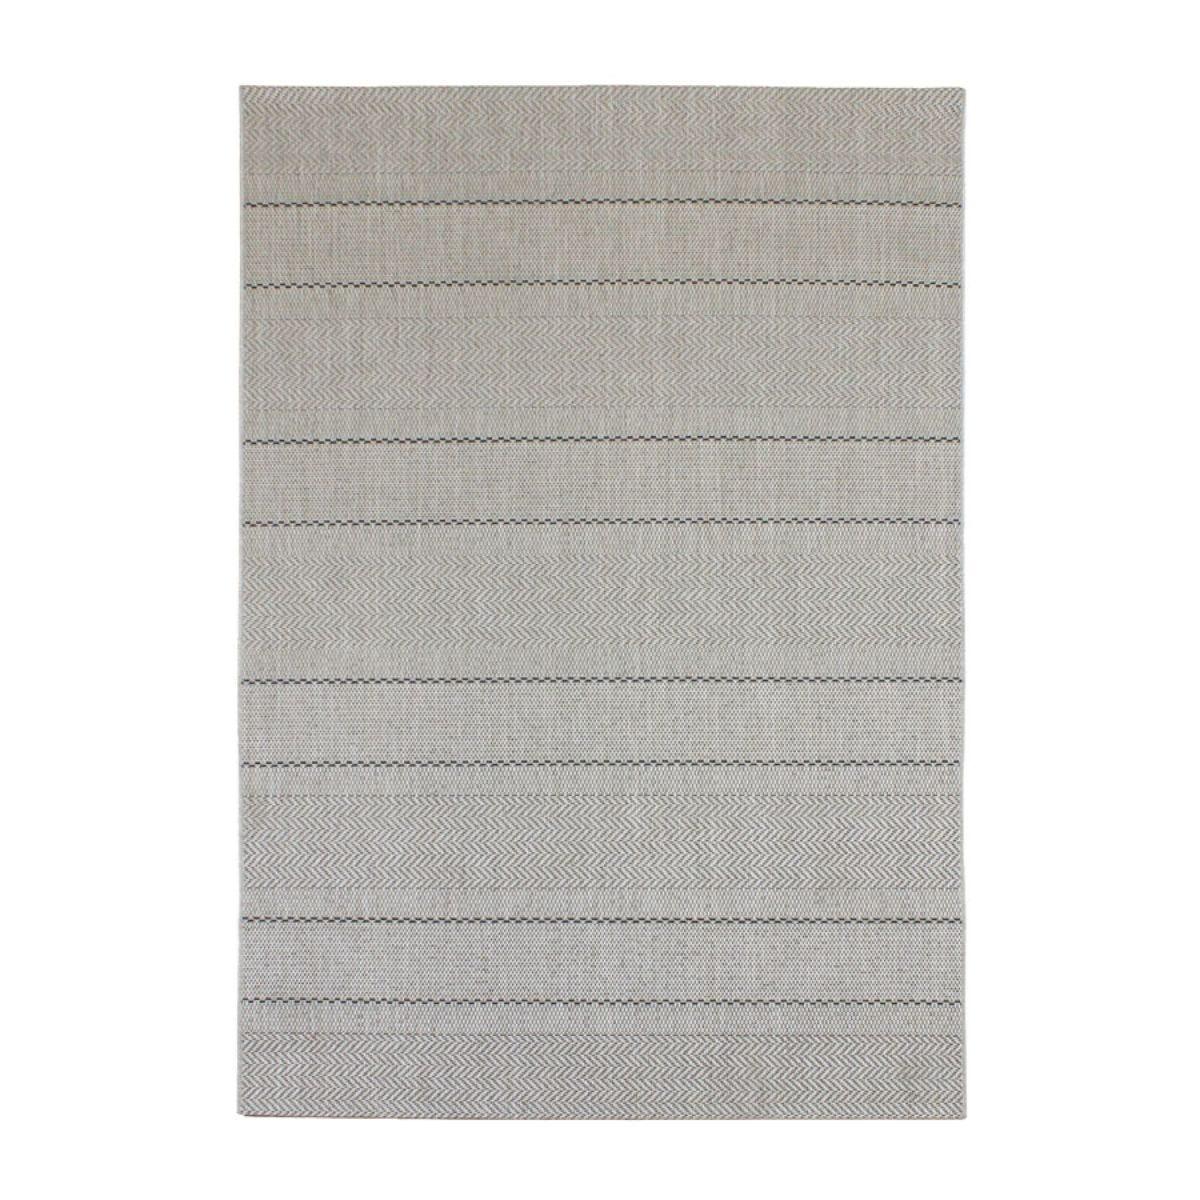 Asiatic Patio Rug, 80 x 150cm - Beige